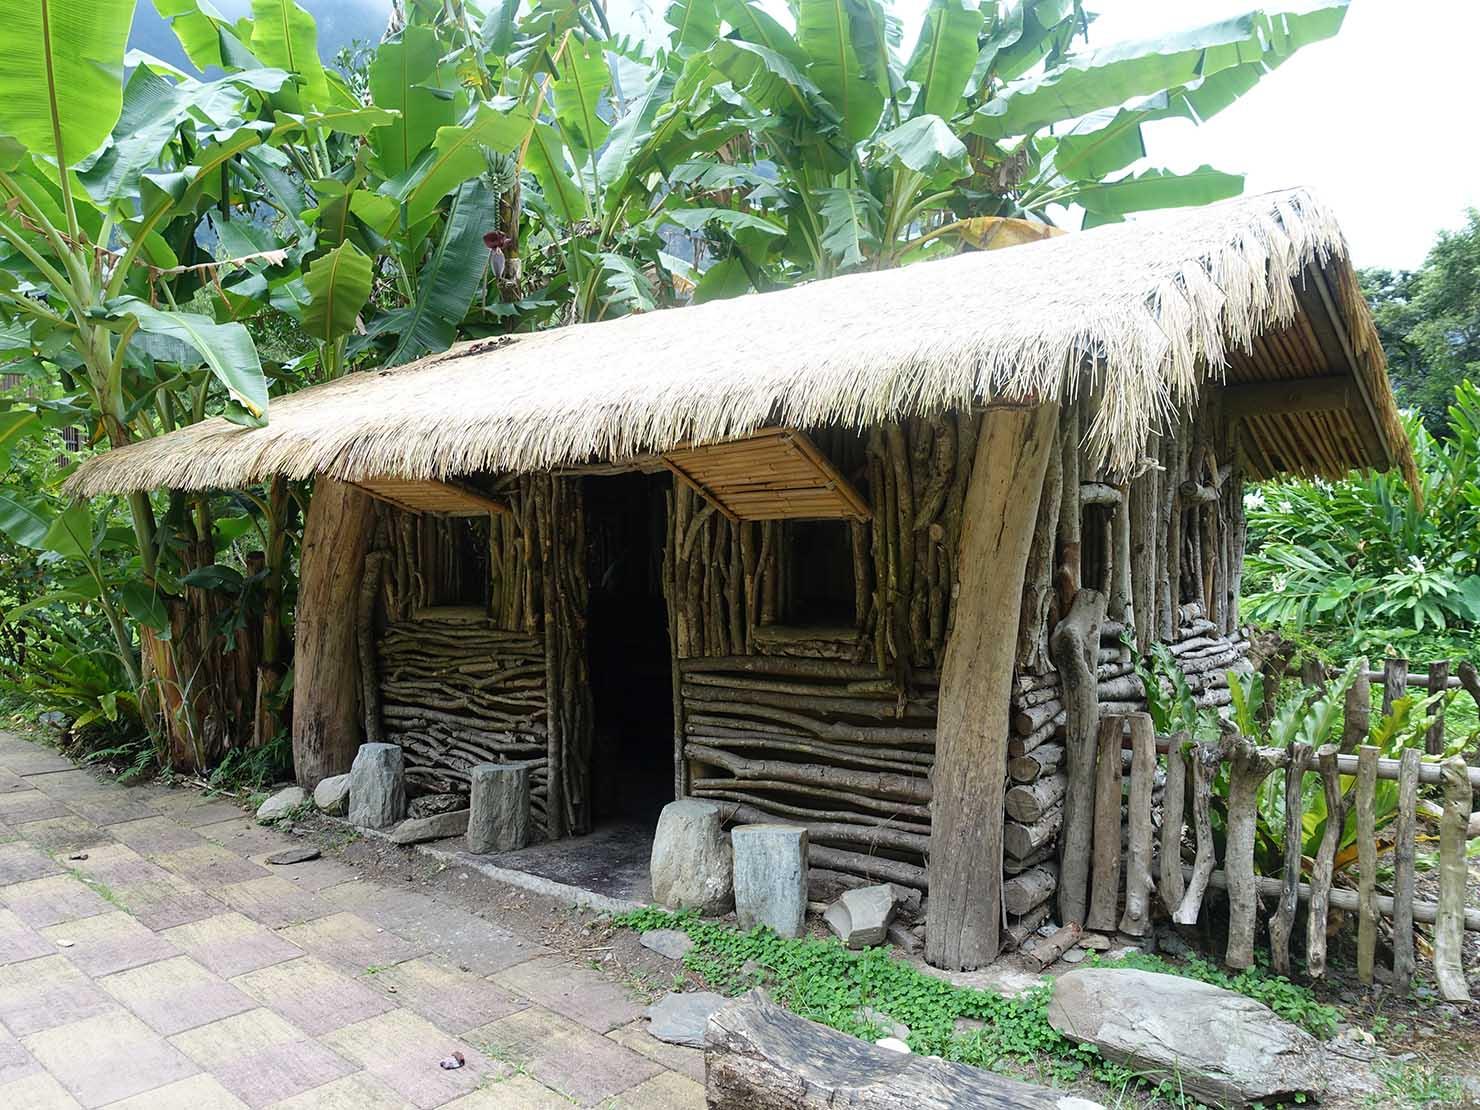 KKday外国人限定「花蓮・太魯閣(タロコ)日帰りツアー」布洛灣のレストラン・山月村の中庭にある原住民族の伝統家屋